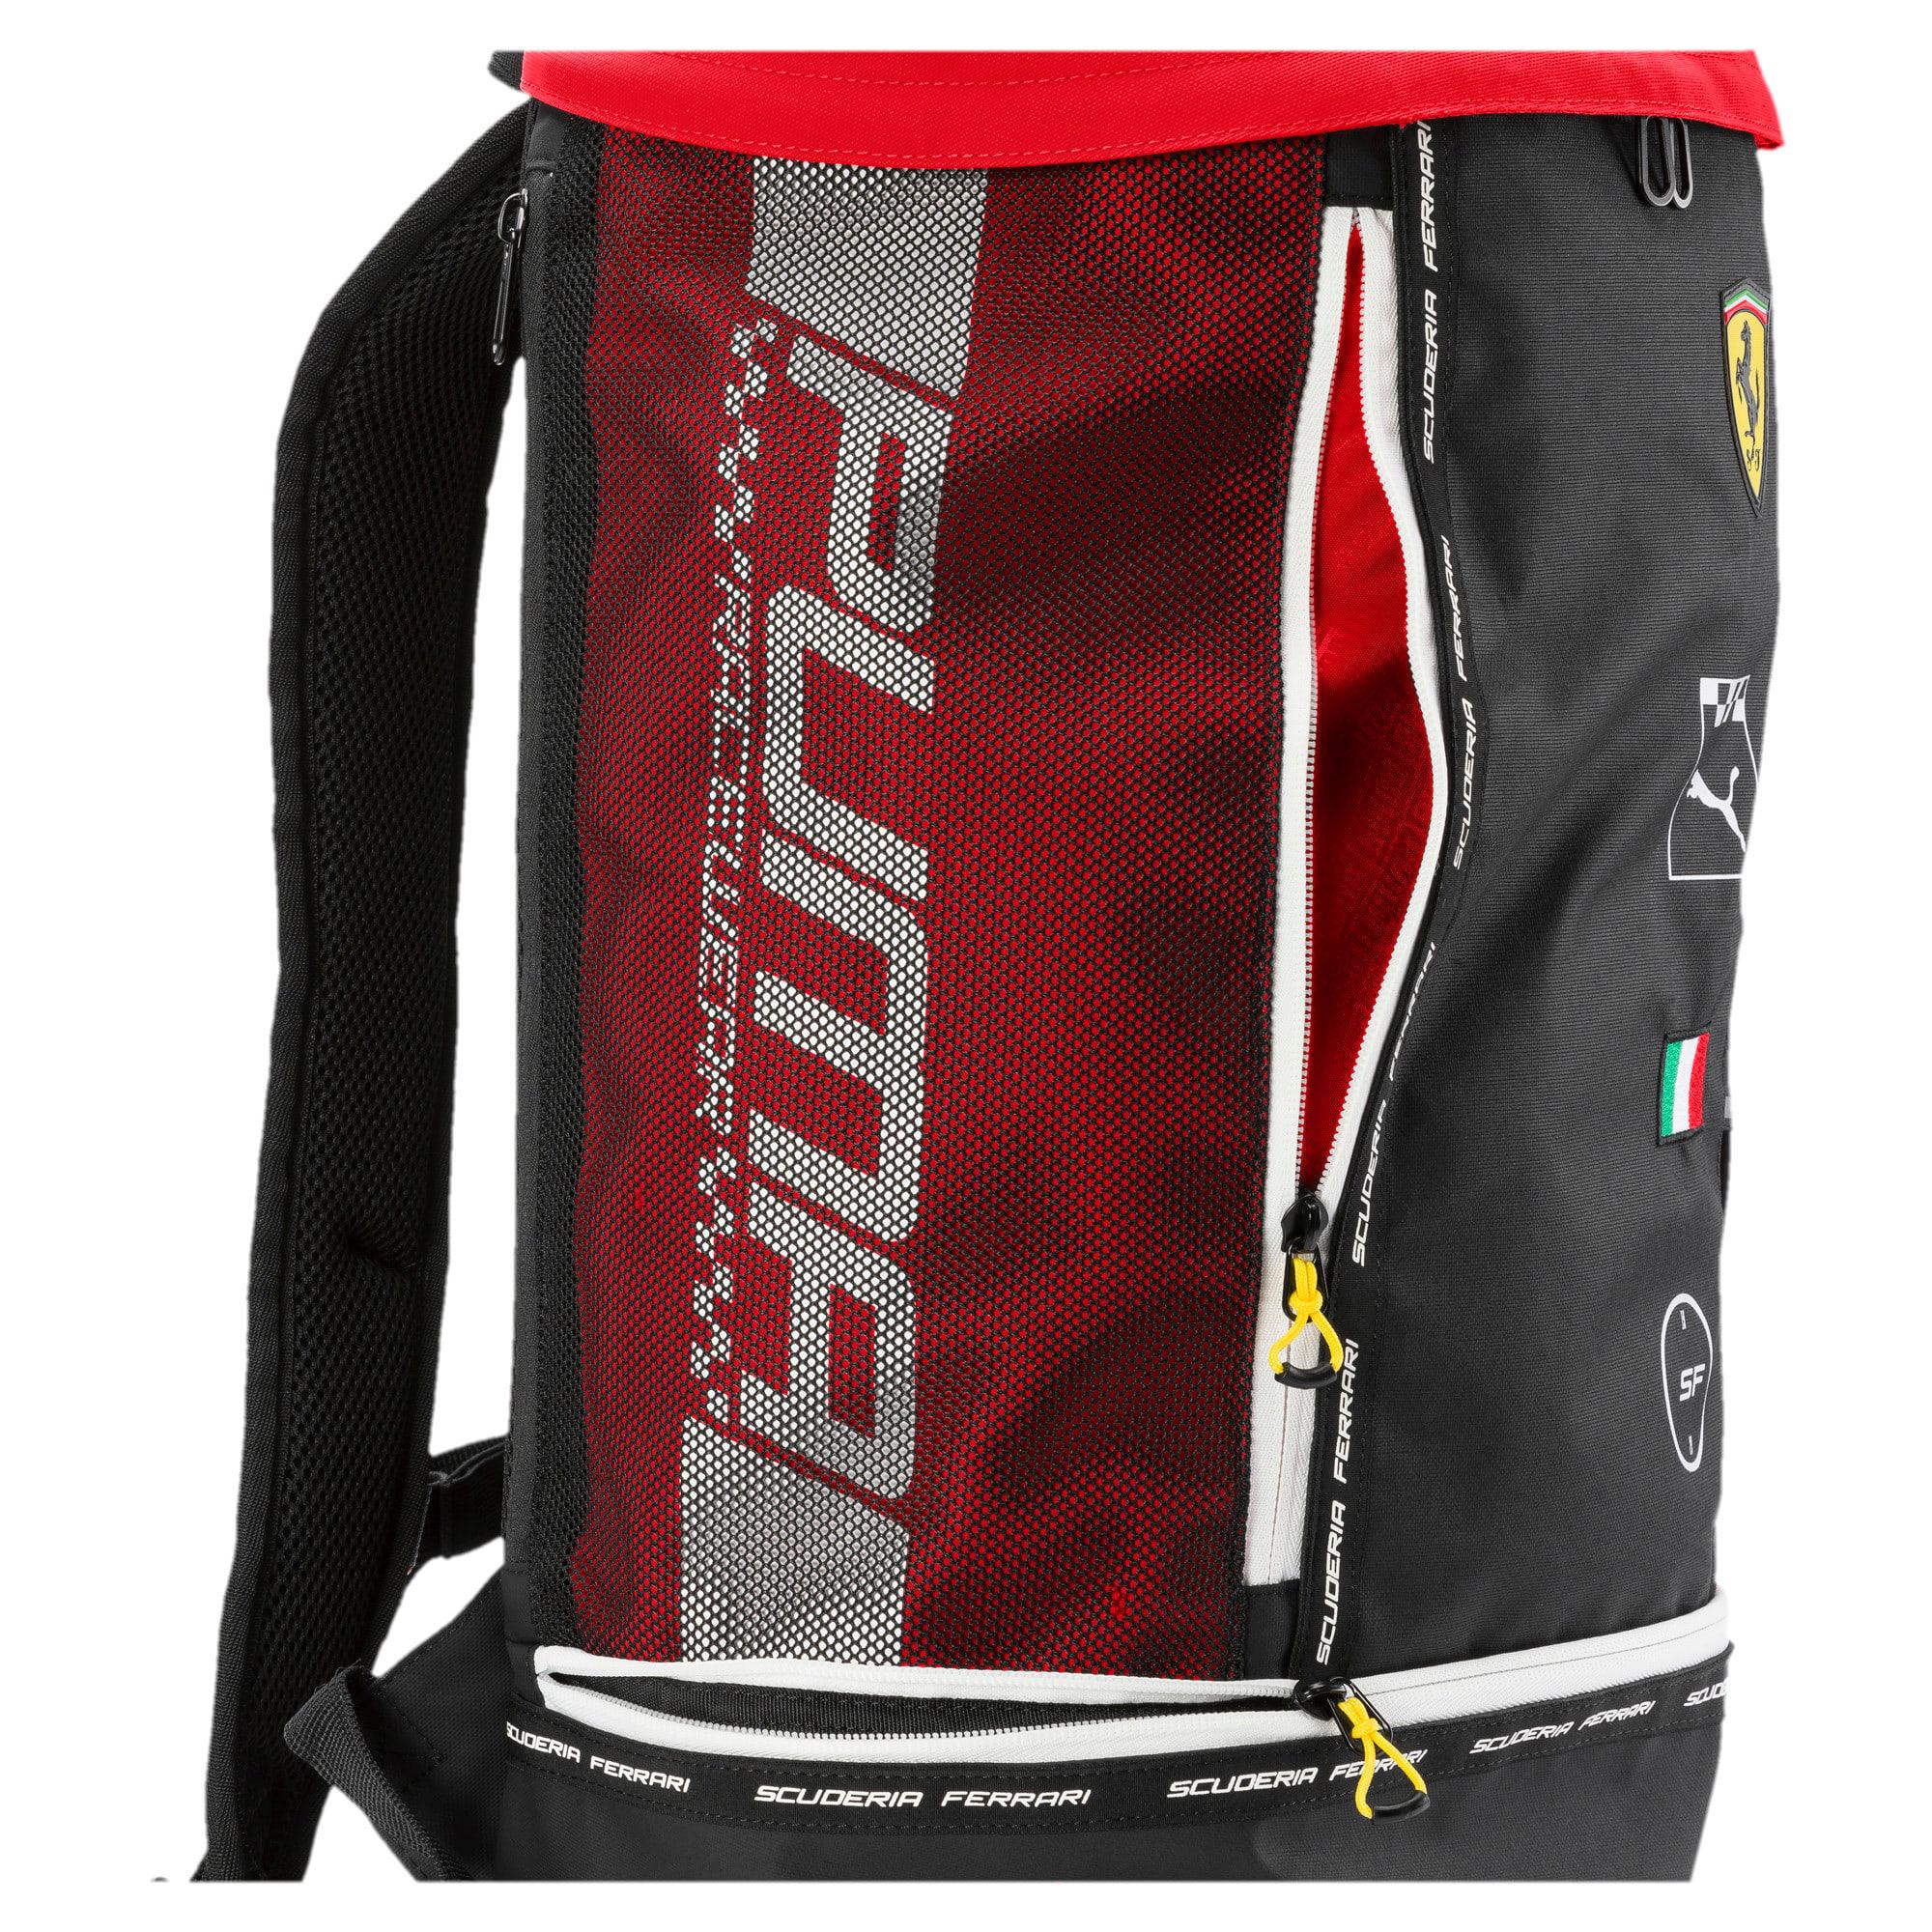 Thumbnail 4 of Scuderia Ferrari Fanwear RCT Backpack, Rosso Corsa, medium